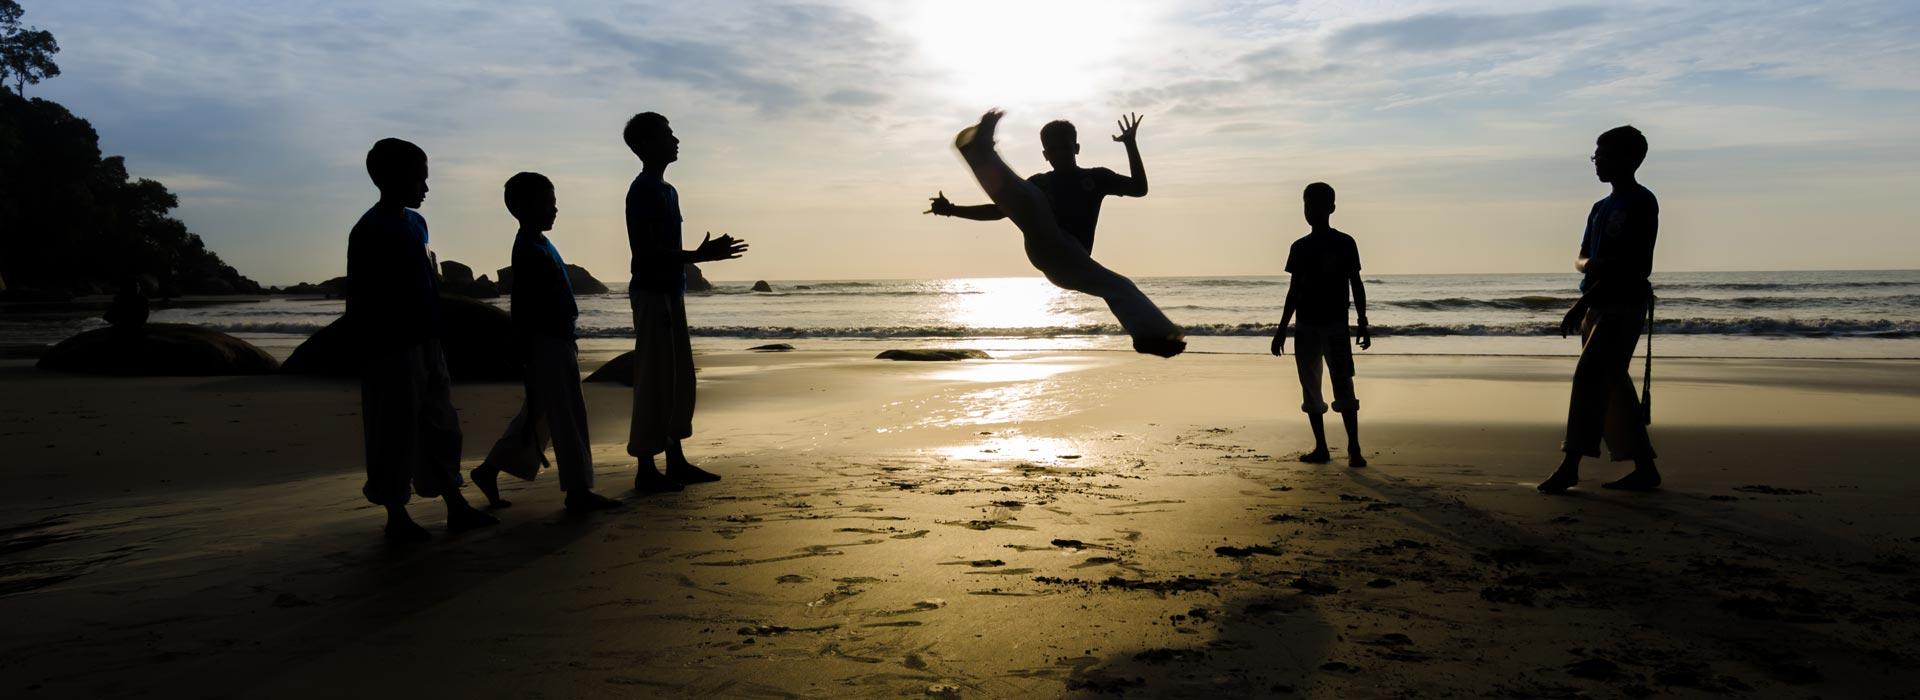 Capoeira Roda near the beach by Capoeirasta